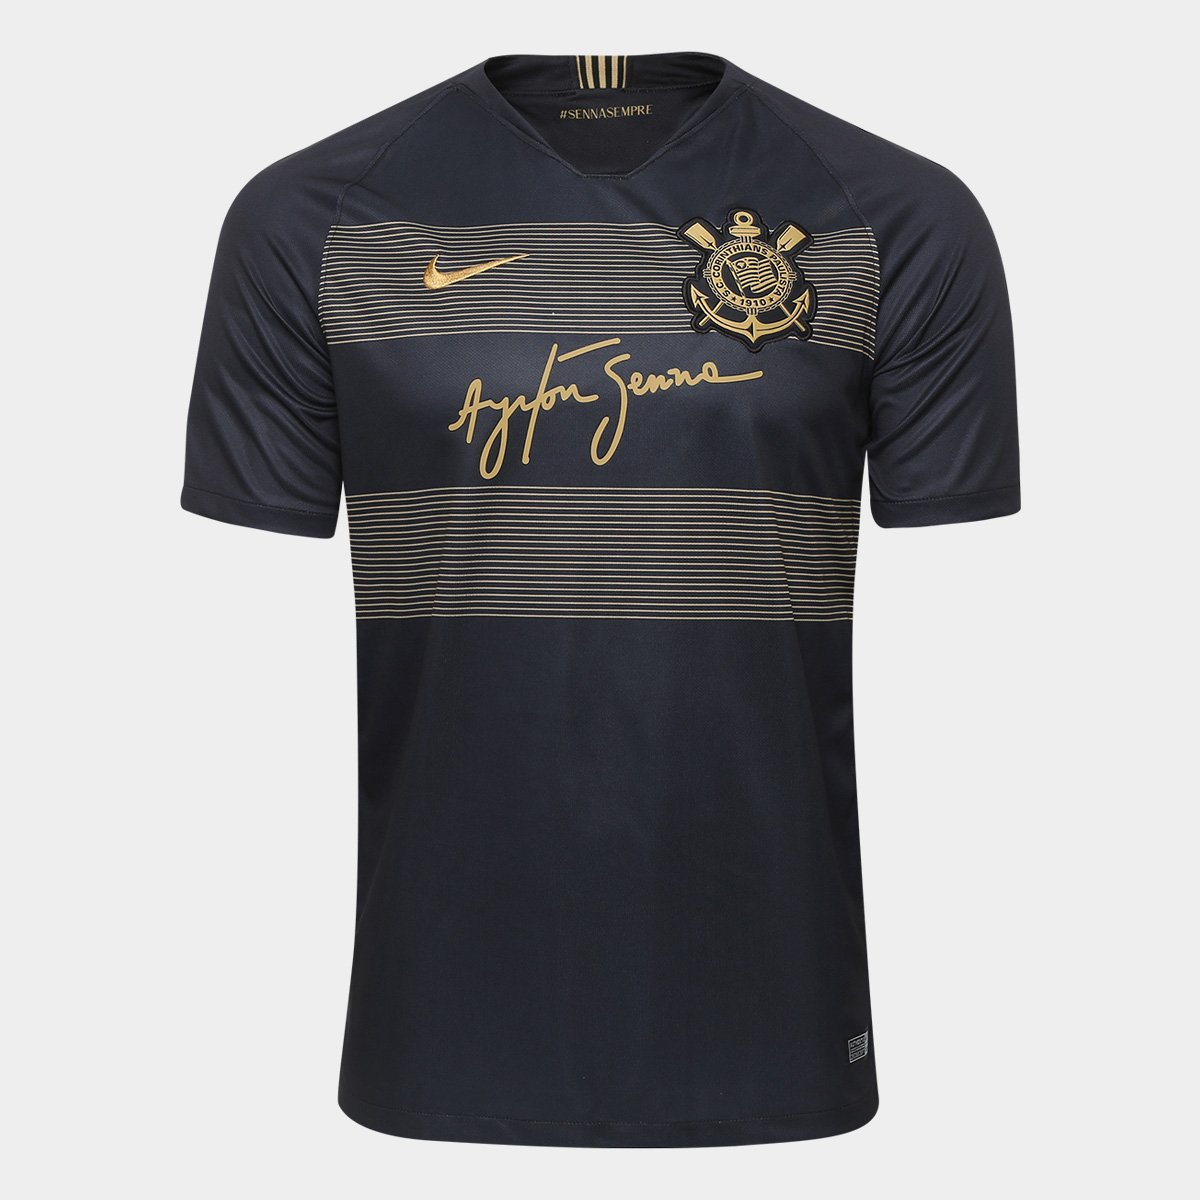 Camisa Corinthians III 2018 s n° - Torcedor Nike Masculina - Preto+Dourado ac761c44e7383